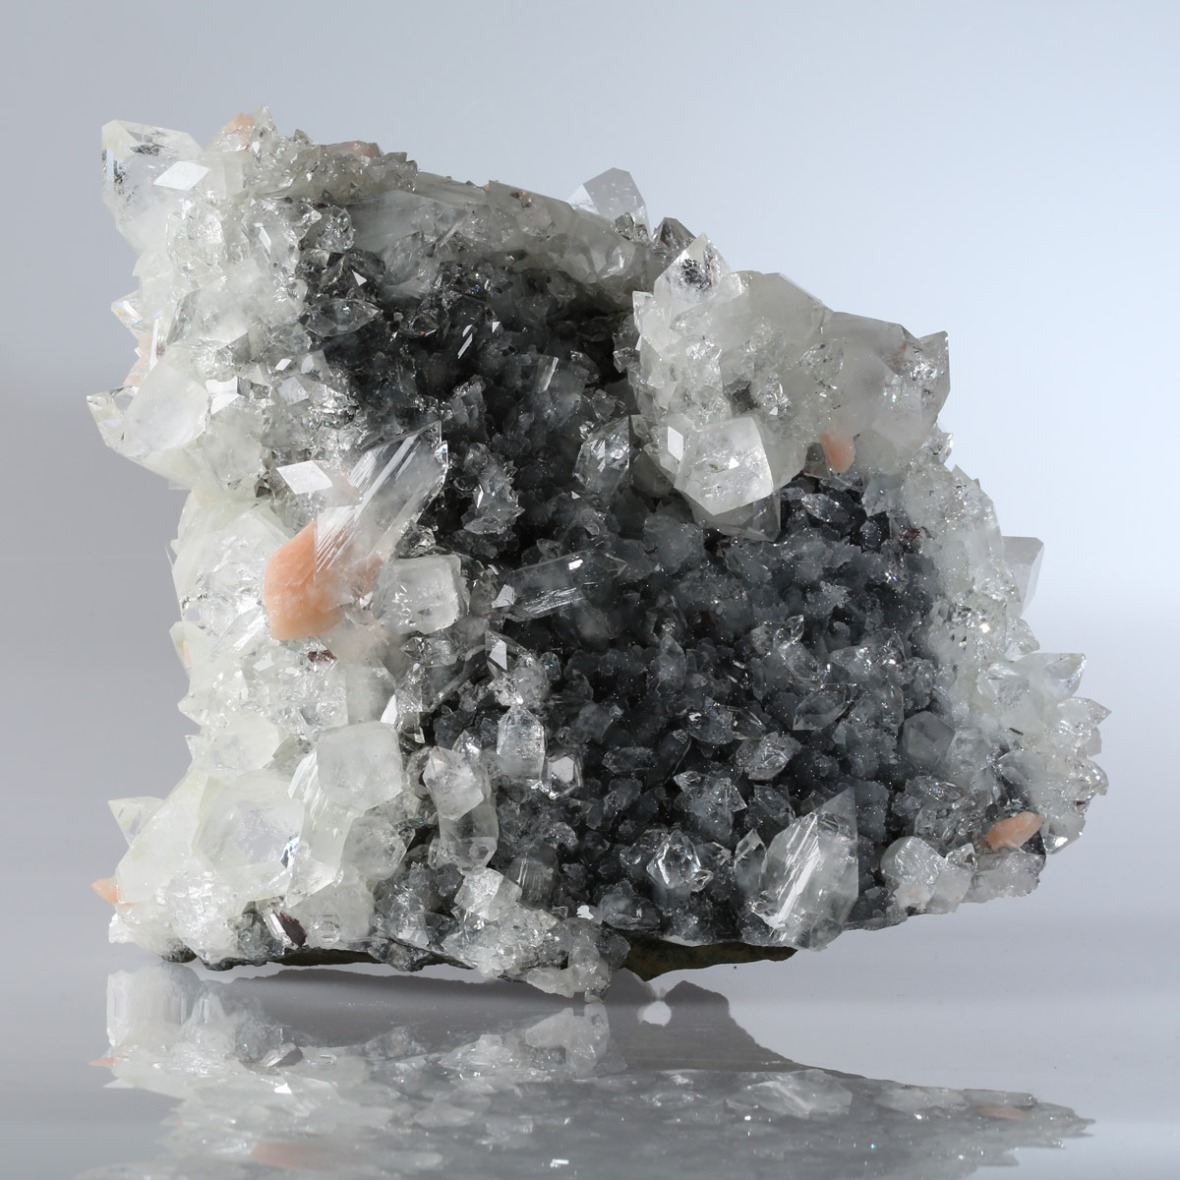 Apophyllite photographed by Serge Briez for Imagin'all (http://www.cristaux-sante.com)